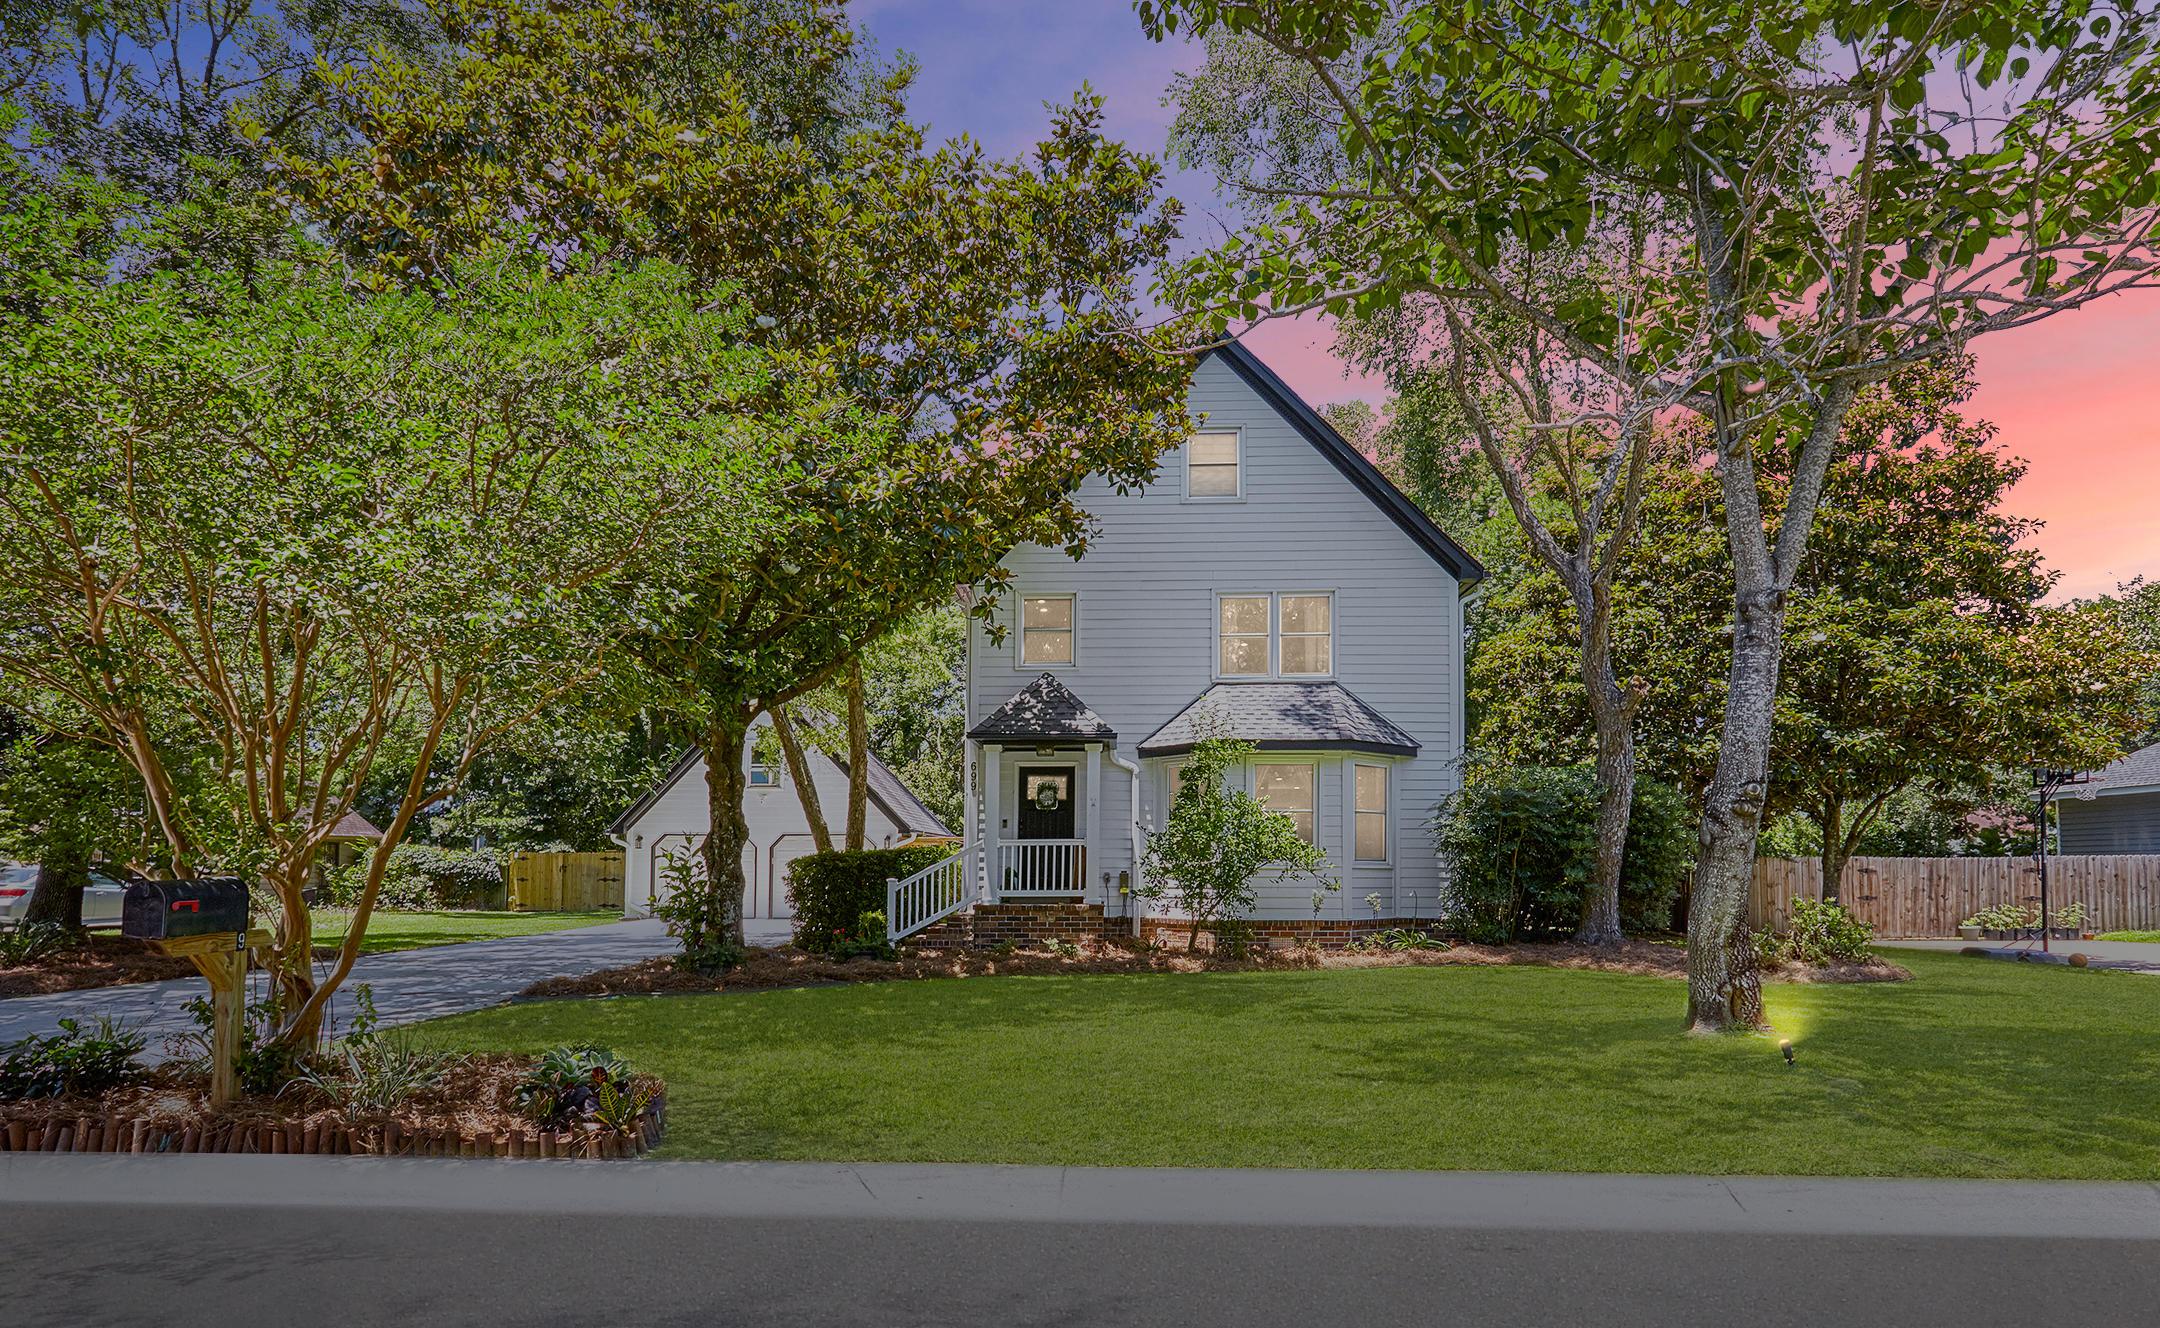 Stiles Point Plantation Homes For Sale - 699 Castle Pinckney, Charleston, SC - 32